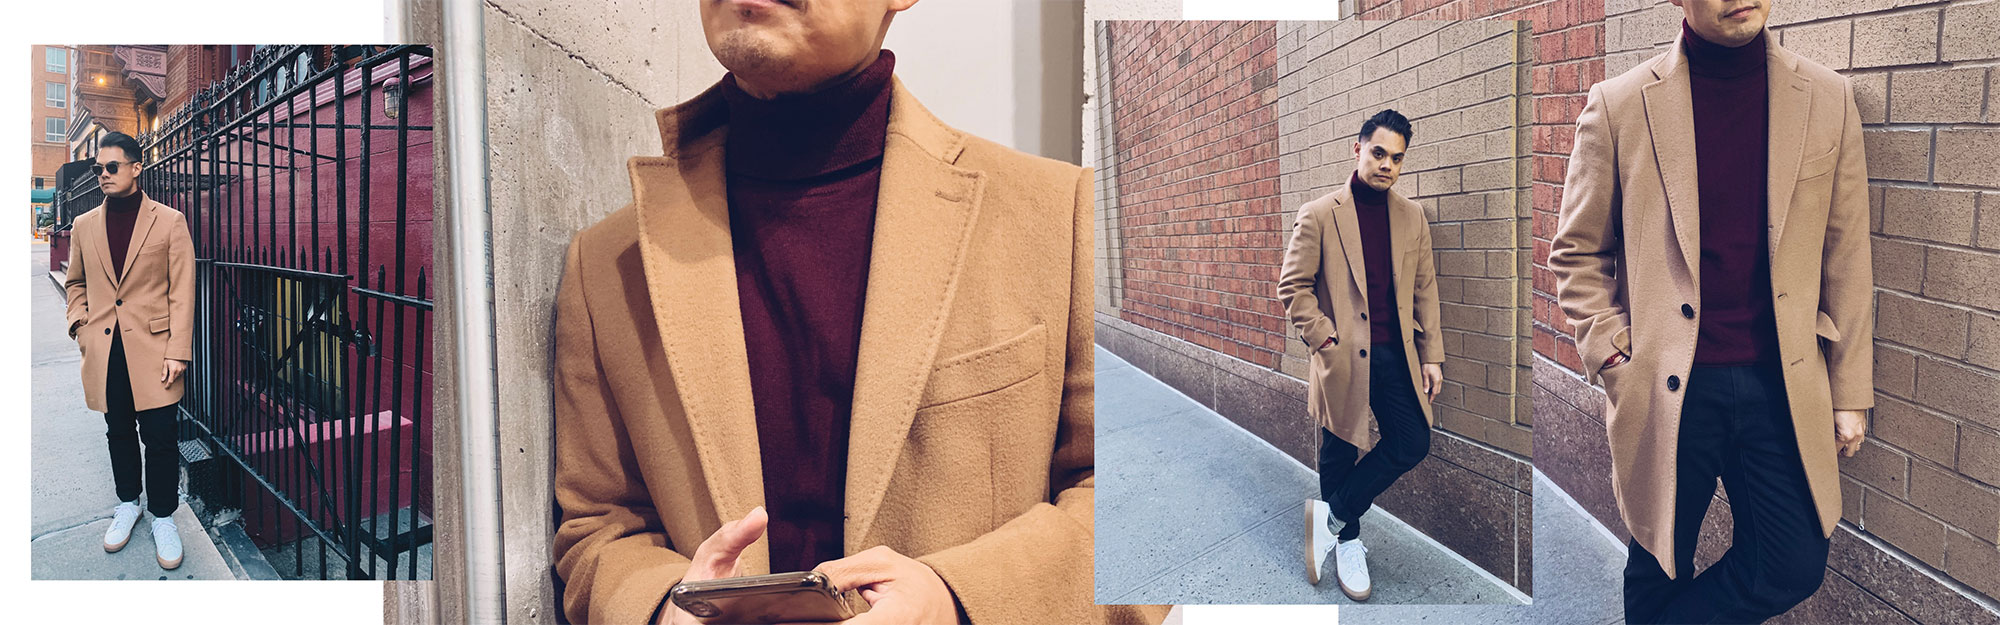 spier & mackay wool cashmere overcoat in camel